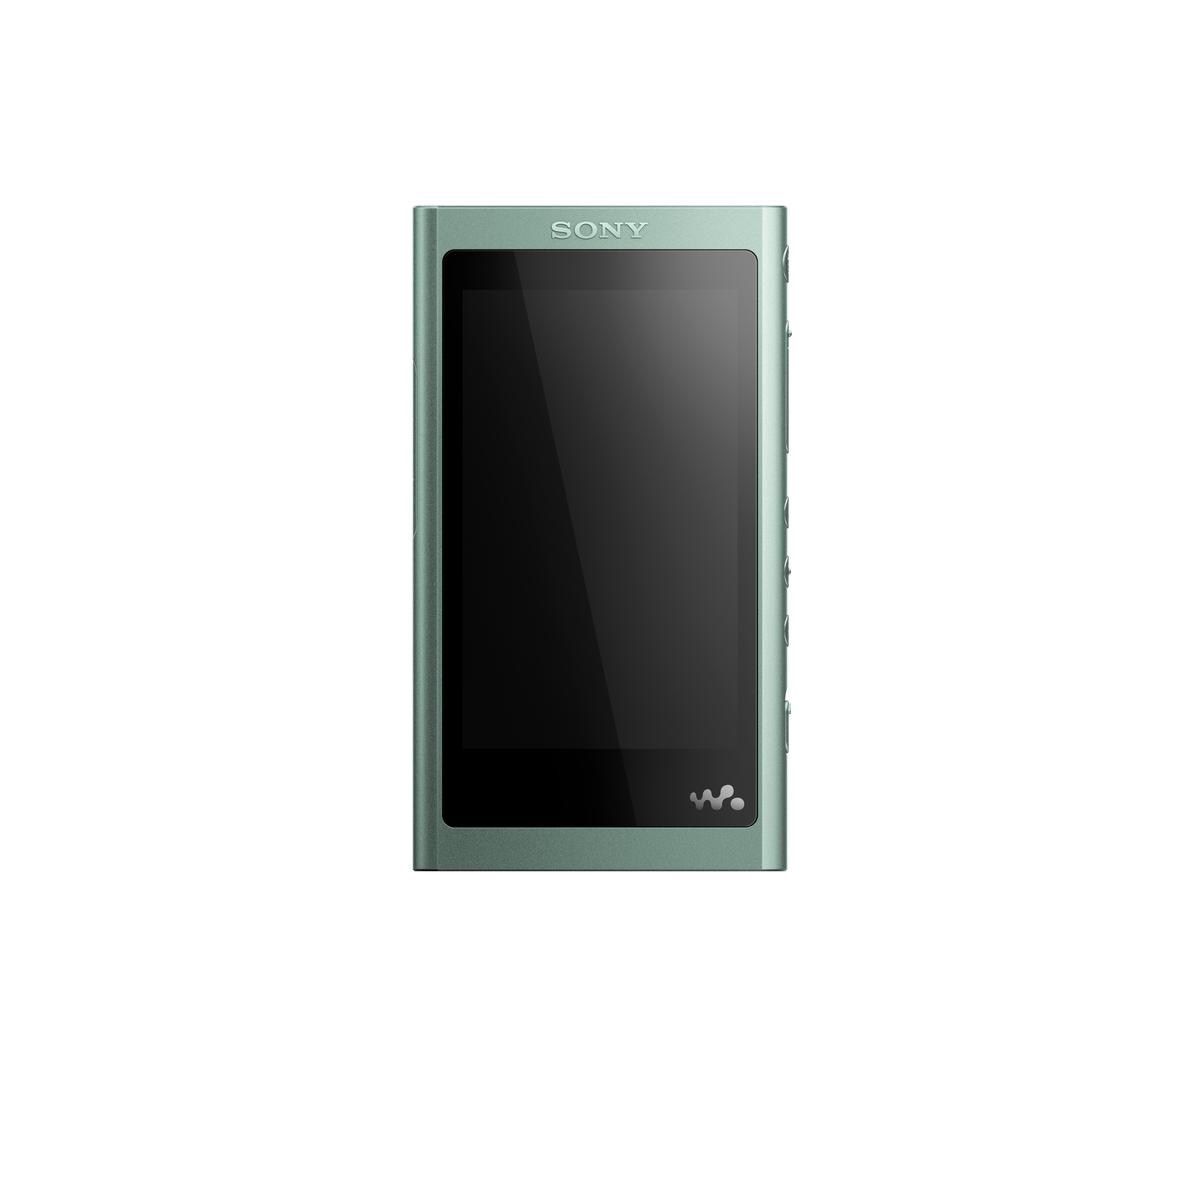 Плеер Sony NW-A55G купить в Sony Centre Воронеж